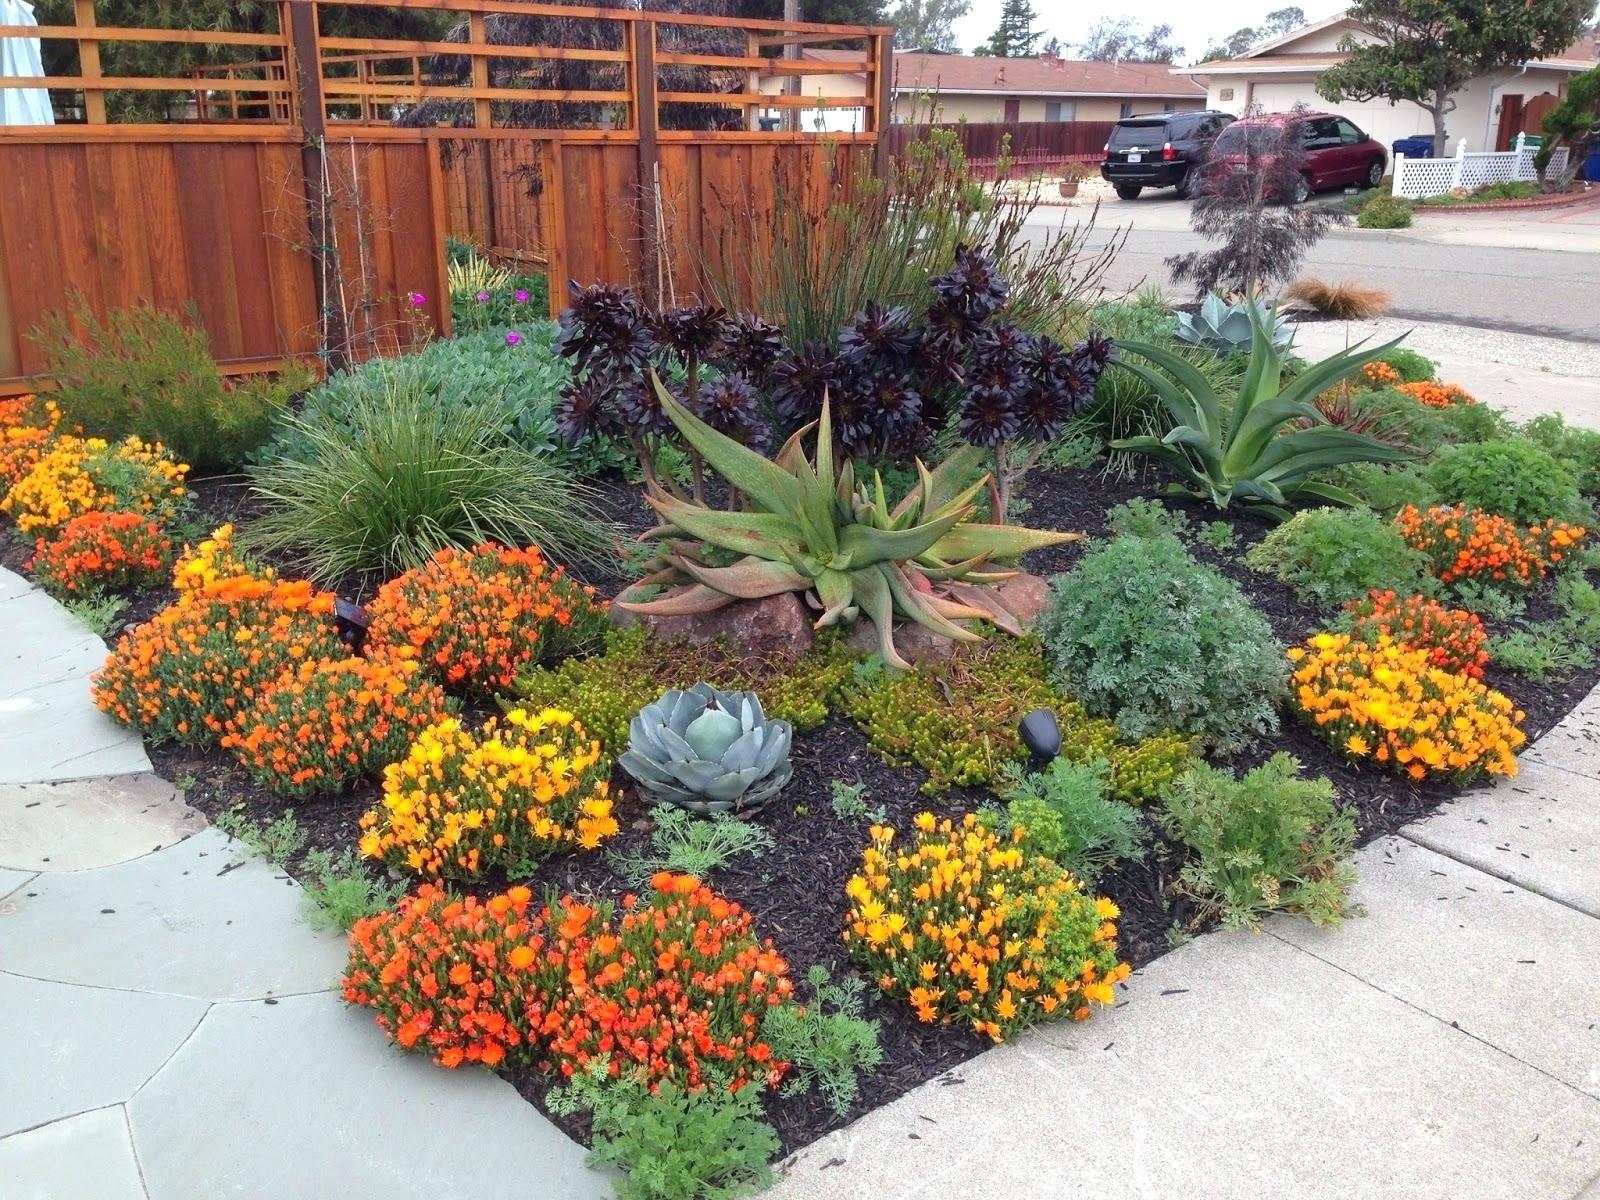 Drought Tolerant Plants Florida Zone 9 Flowering Full Sun Drought Tolerant Garden Drought Resistant Landscaping Drought Tolerant Landscape Design